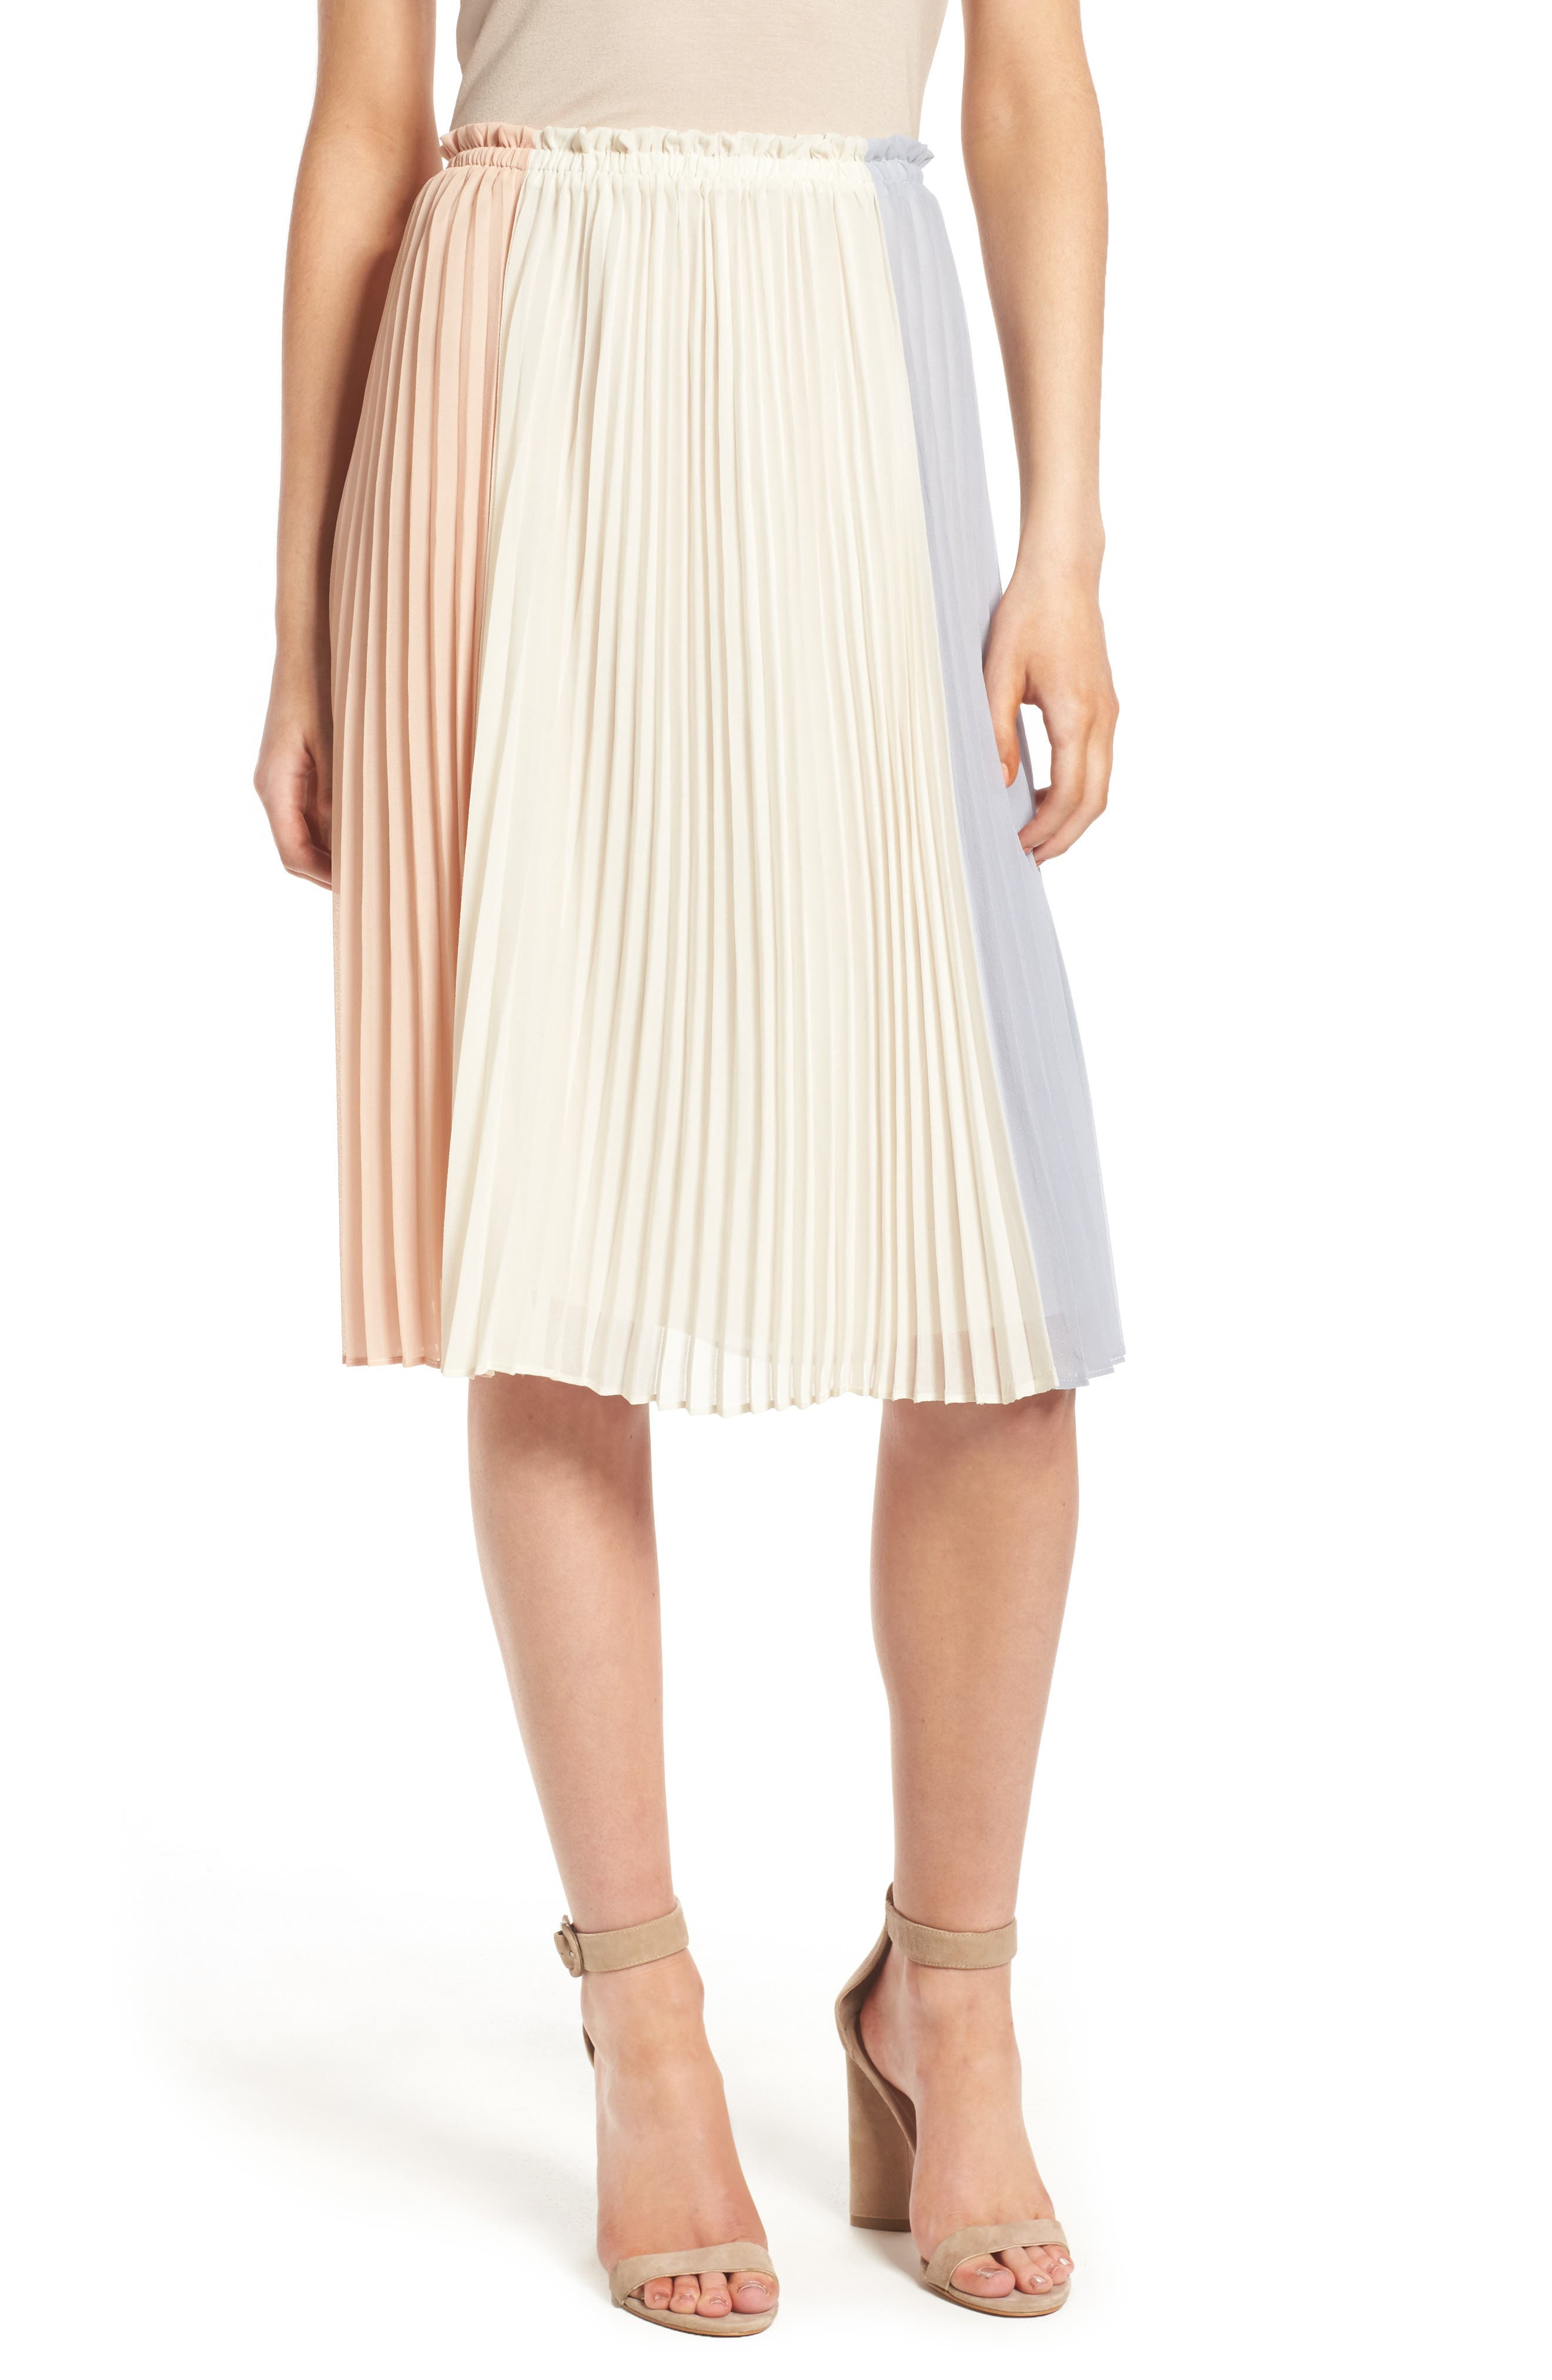 Alternate Image 1 Selected - June & Hudson Colorblock Pleat Skirt